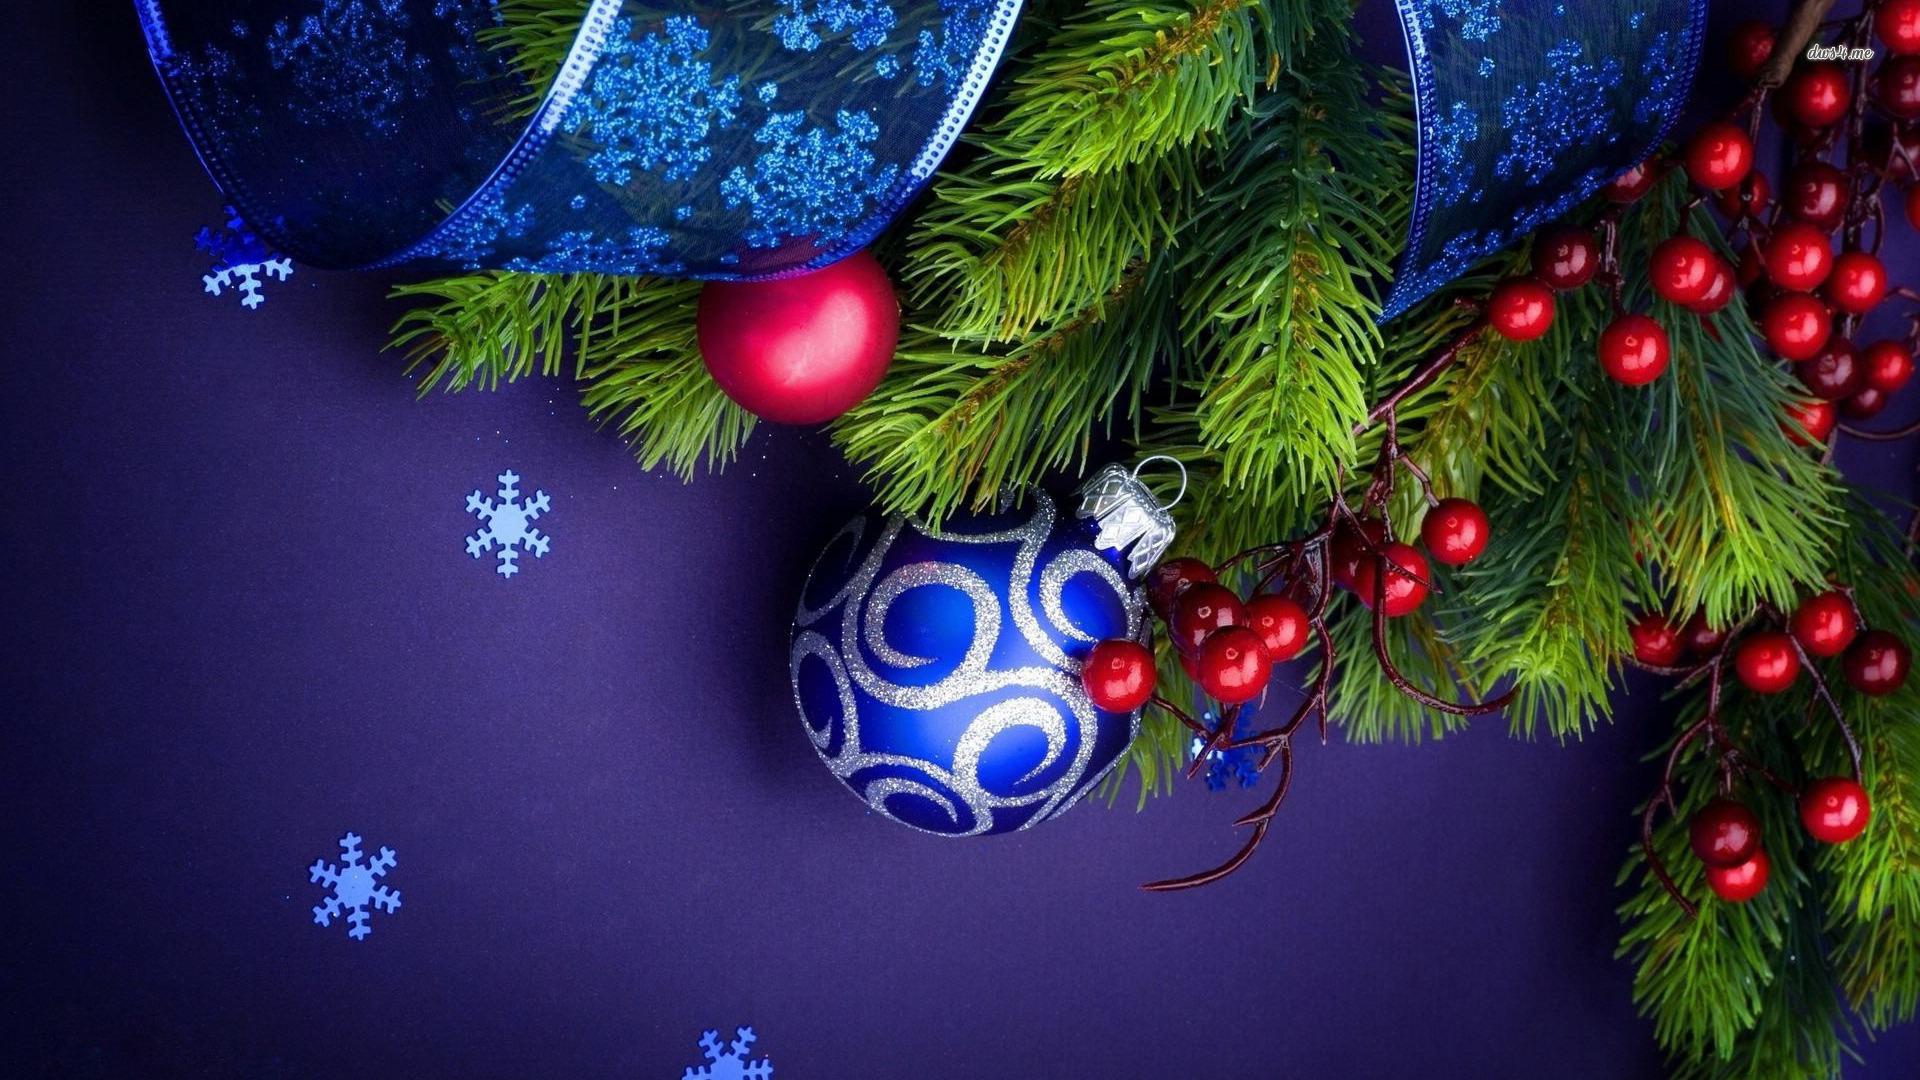 Christmas Wallpaper Blue